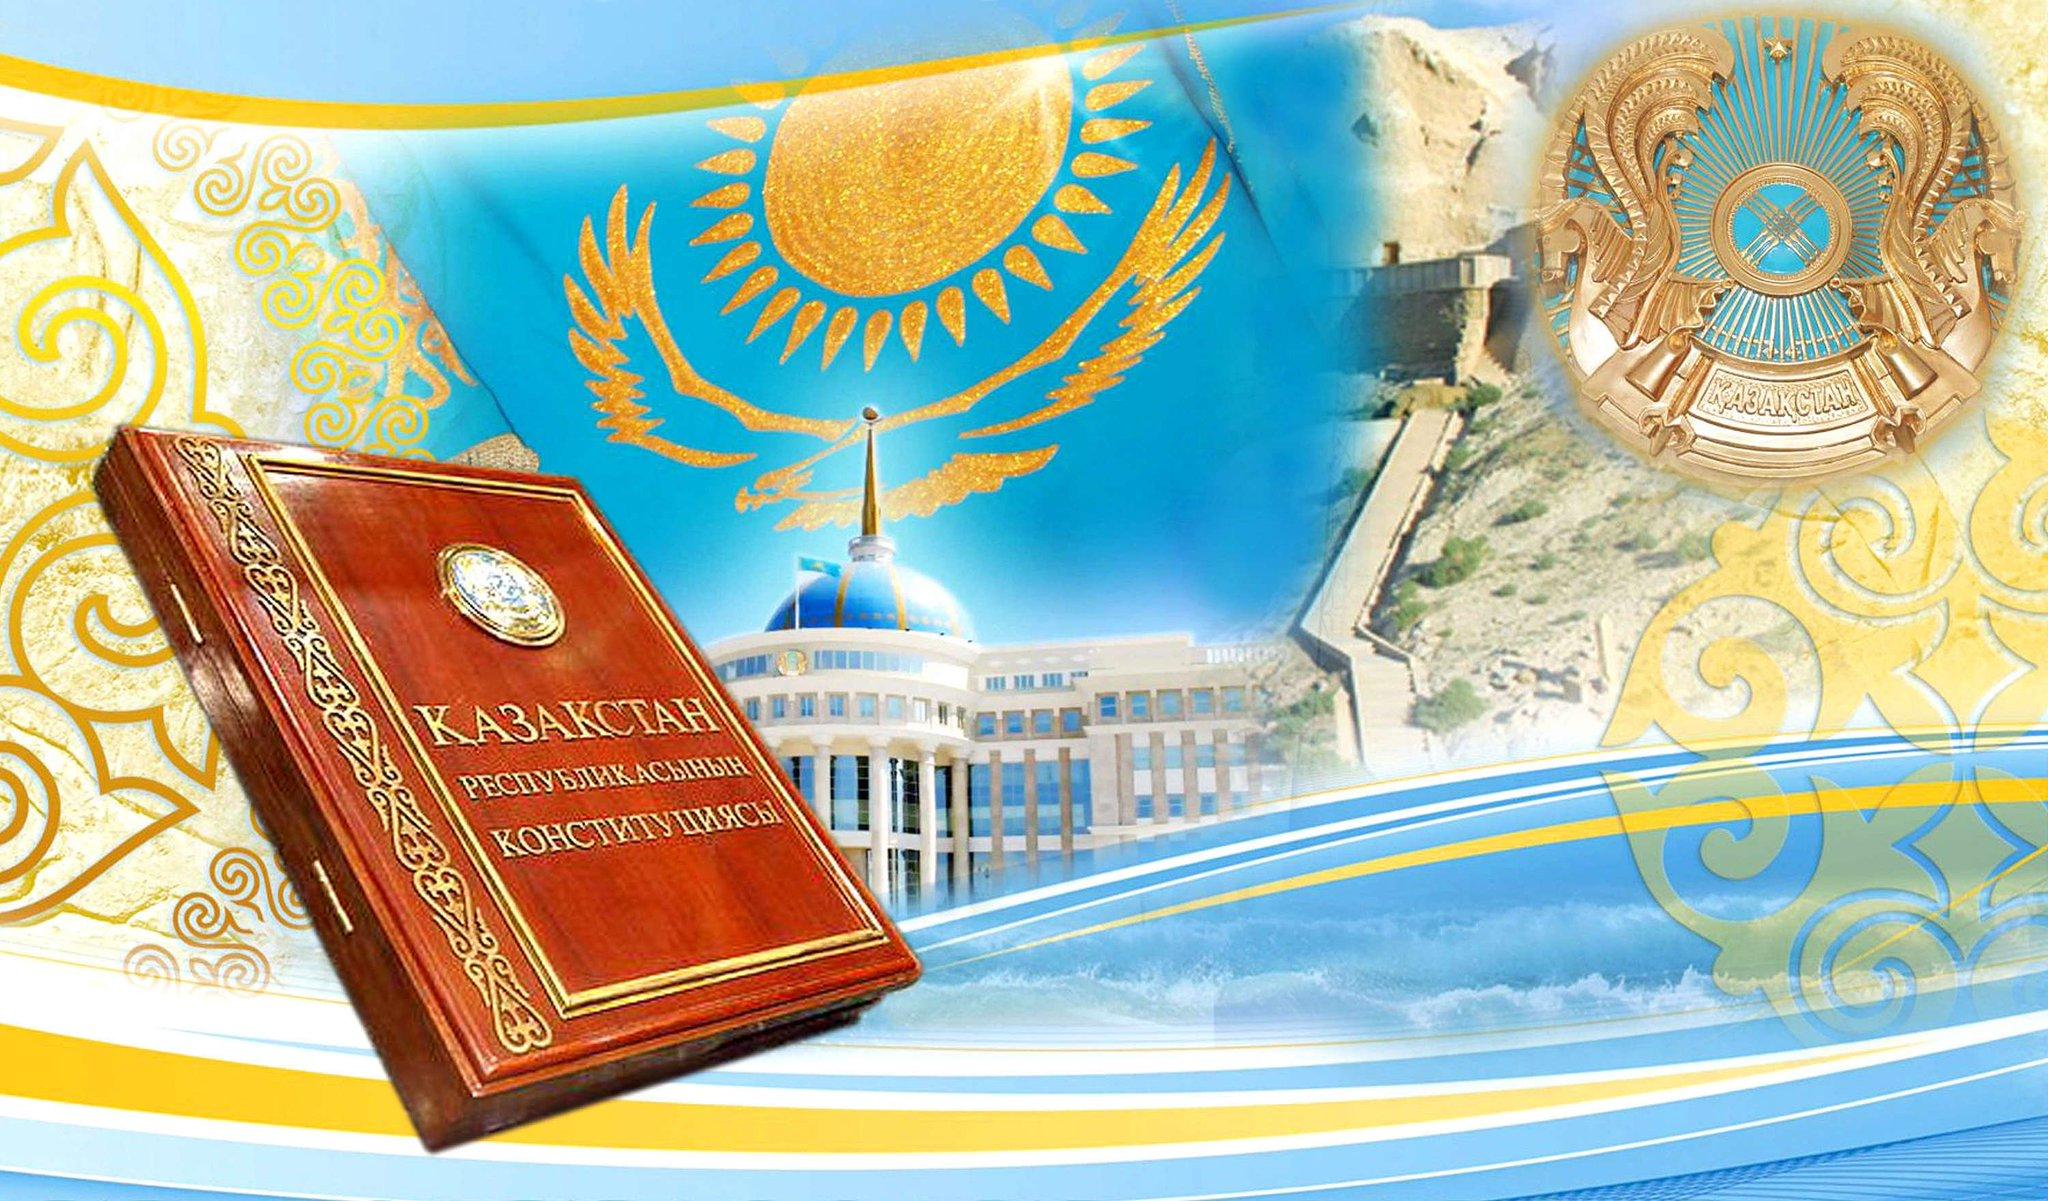 фото к дню конституции казахстана